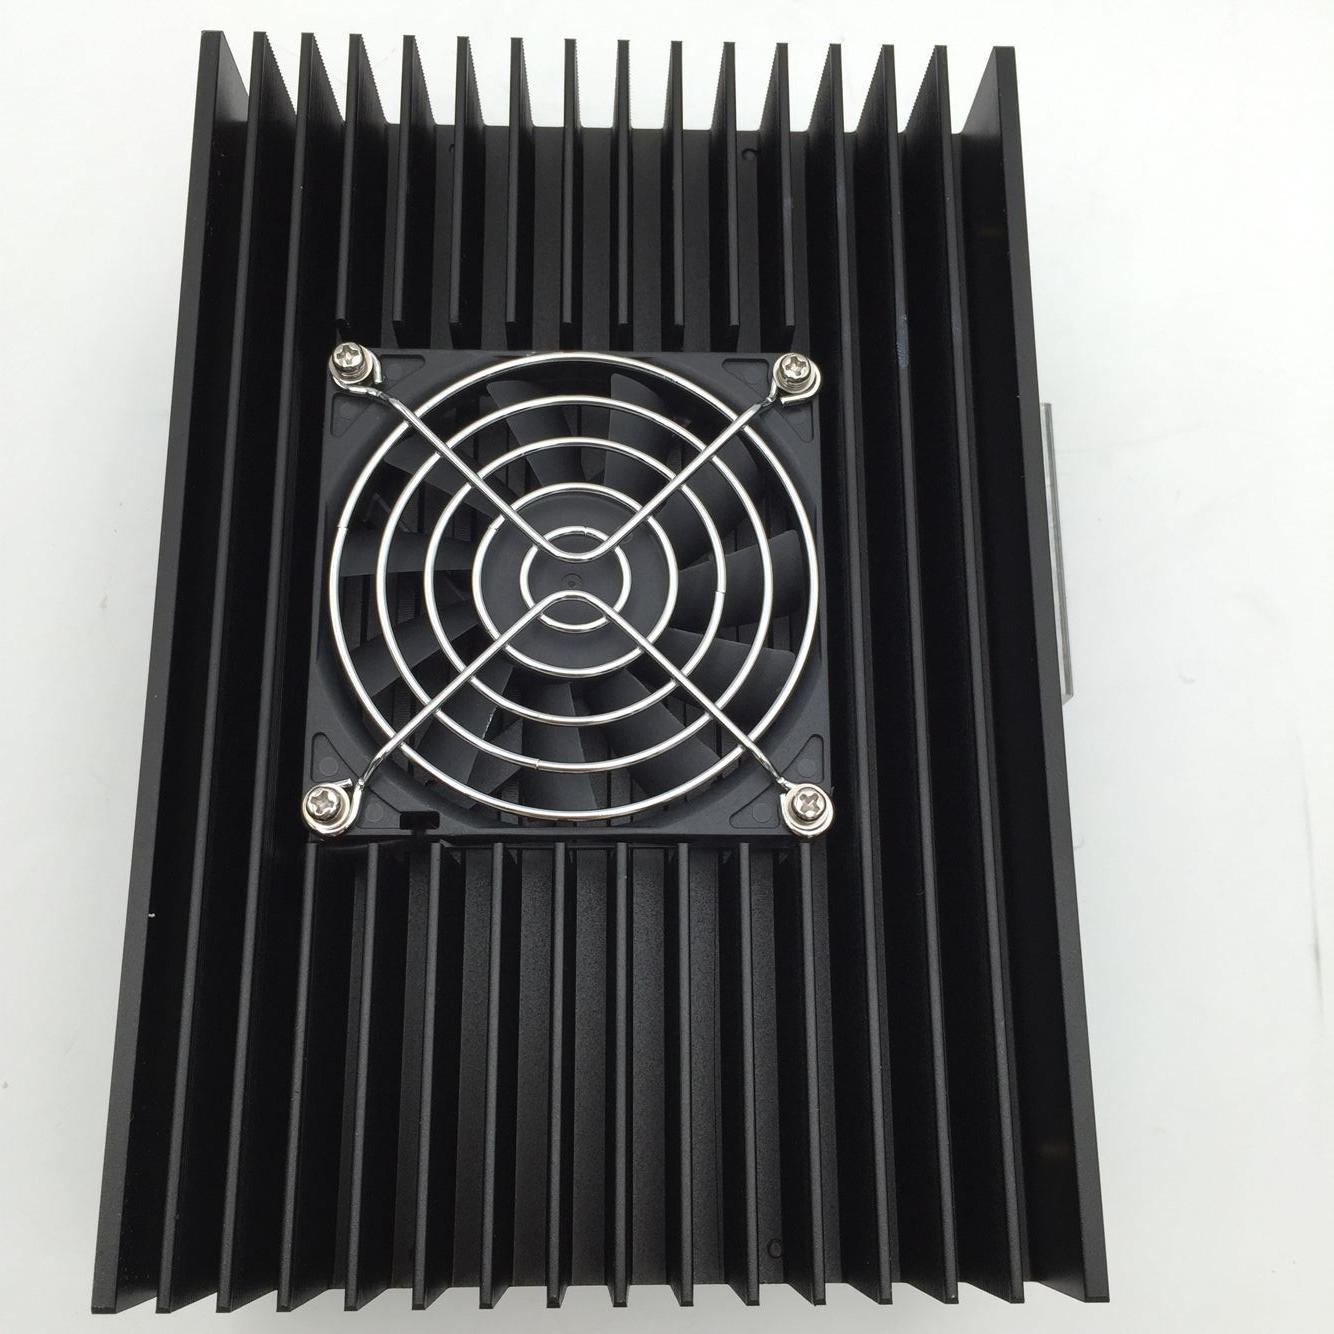 Leadshine DM2282 CNC DSP Stepper Drive 2ph 180~240VAC Match Nema 34 42 52 Motor